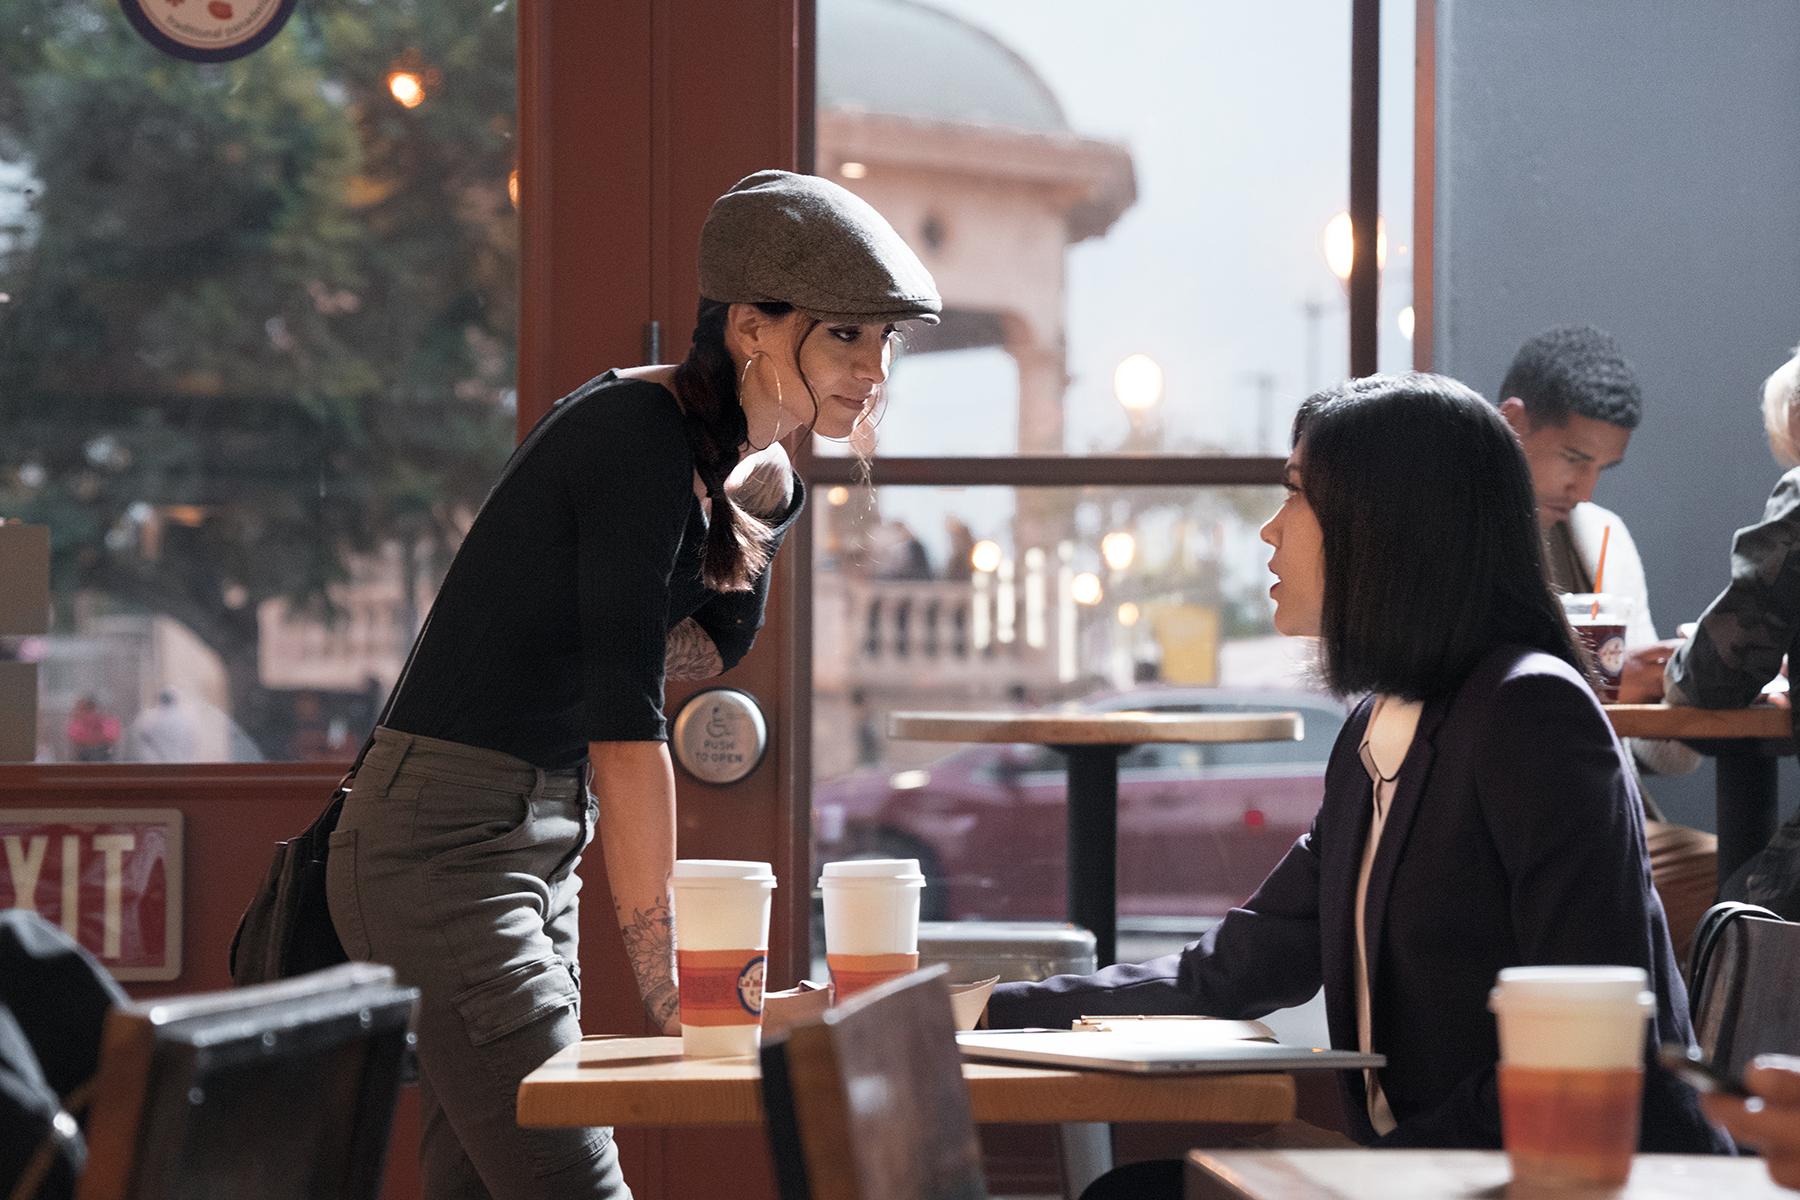 The Trailer for Season 2 of 'Vida' Is Chock-Full of Chingonas, Butches & Femmes